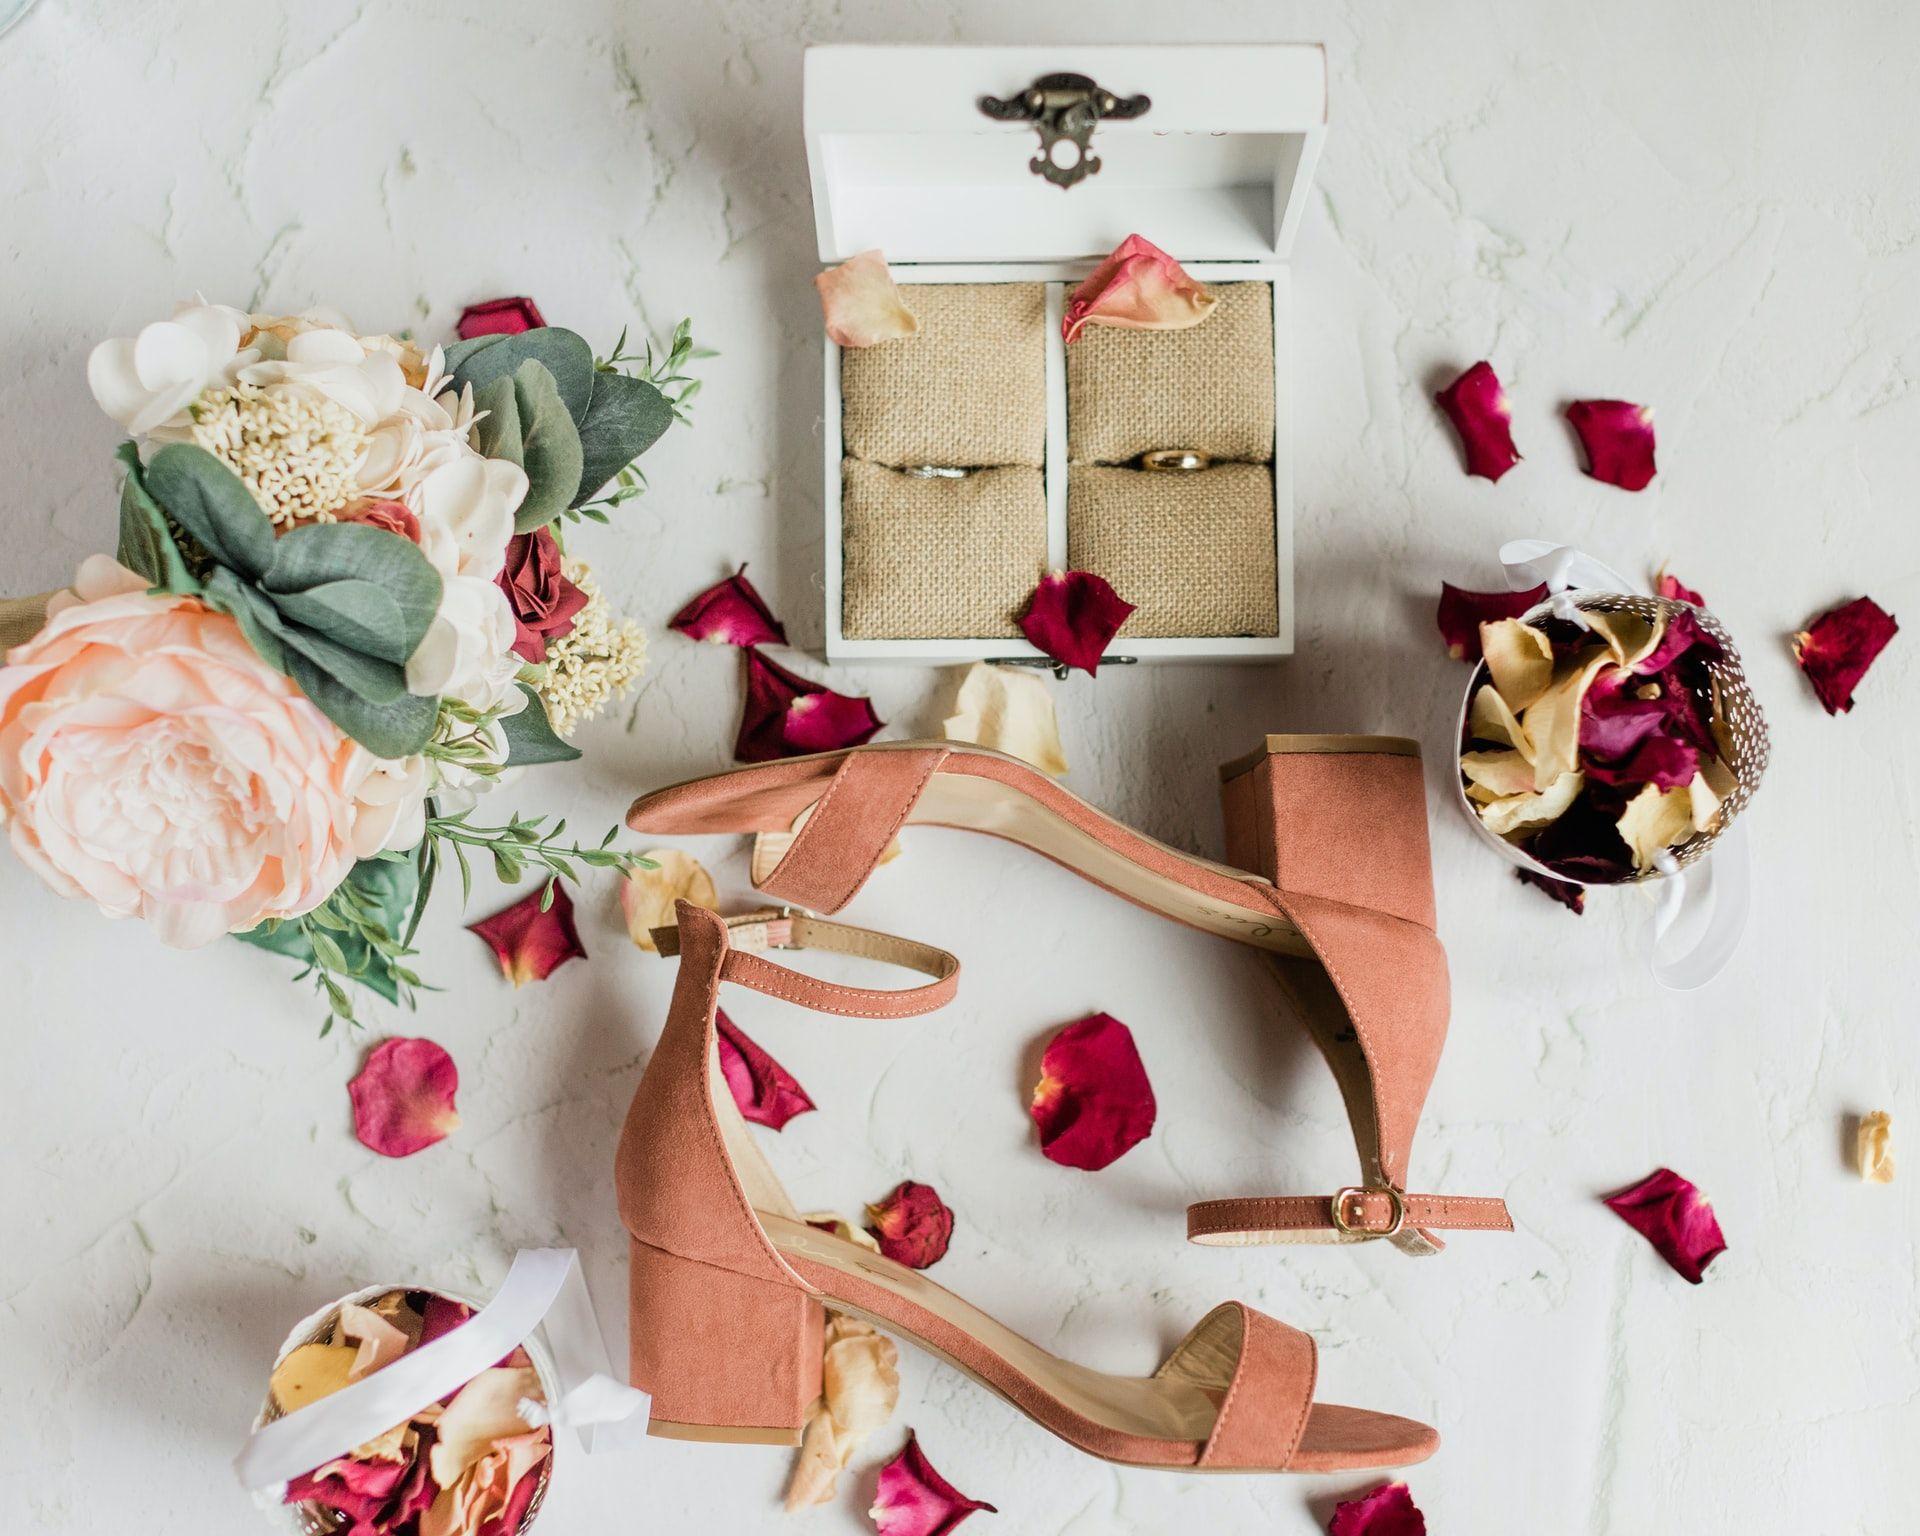 Postaw na sezonowe dodatki weselne